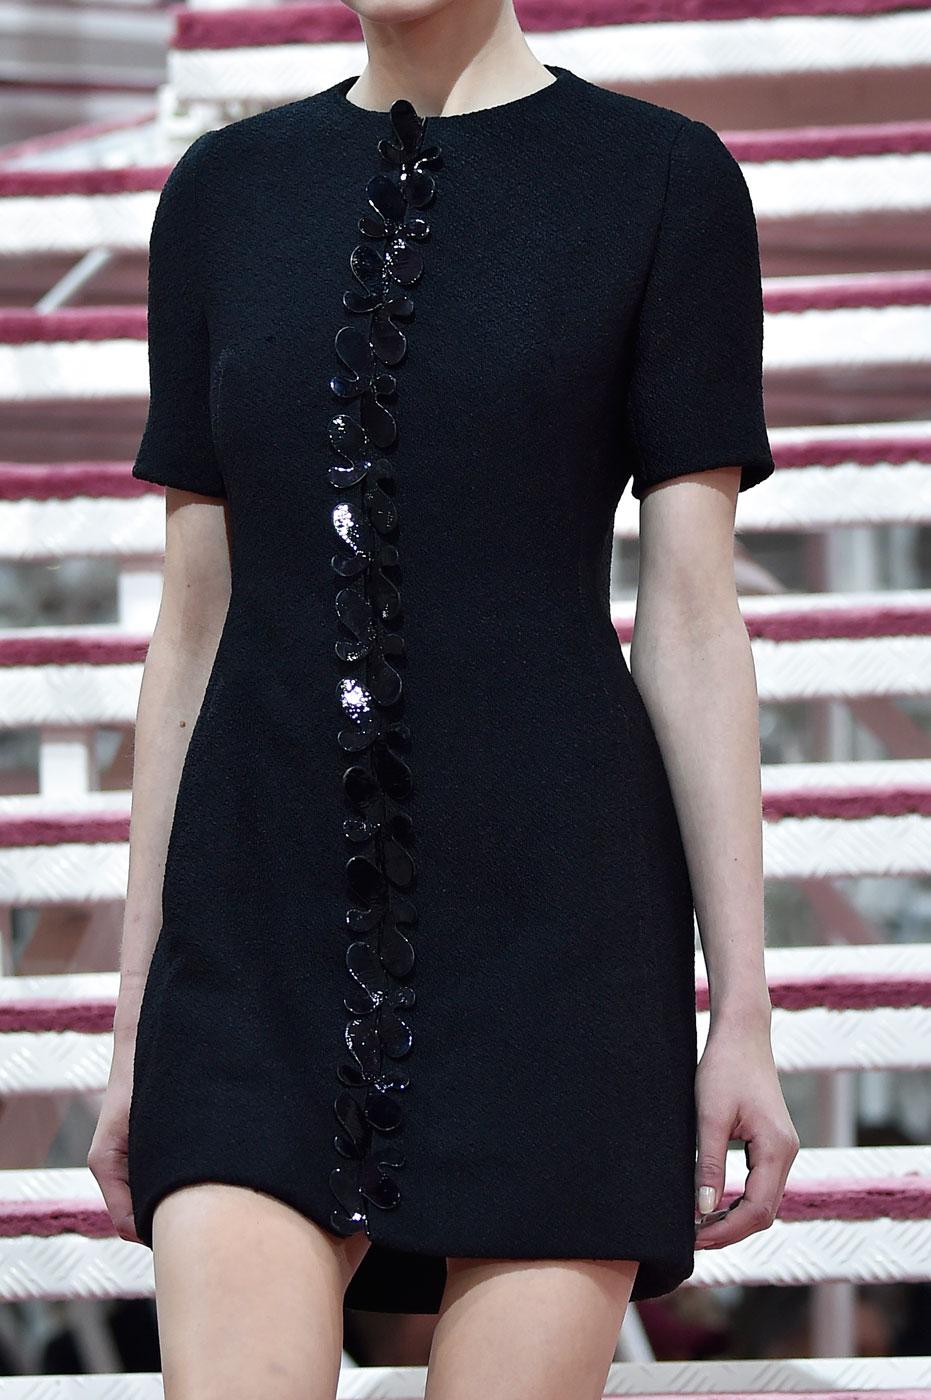 Christian-Dior-fashion-runway-show-close-ups-haute-couture-paris-spring-summer-2015-the-impression-028